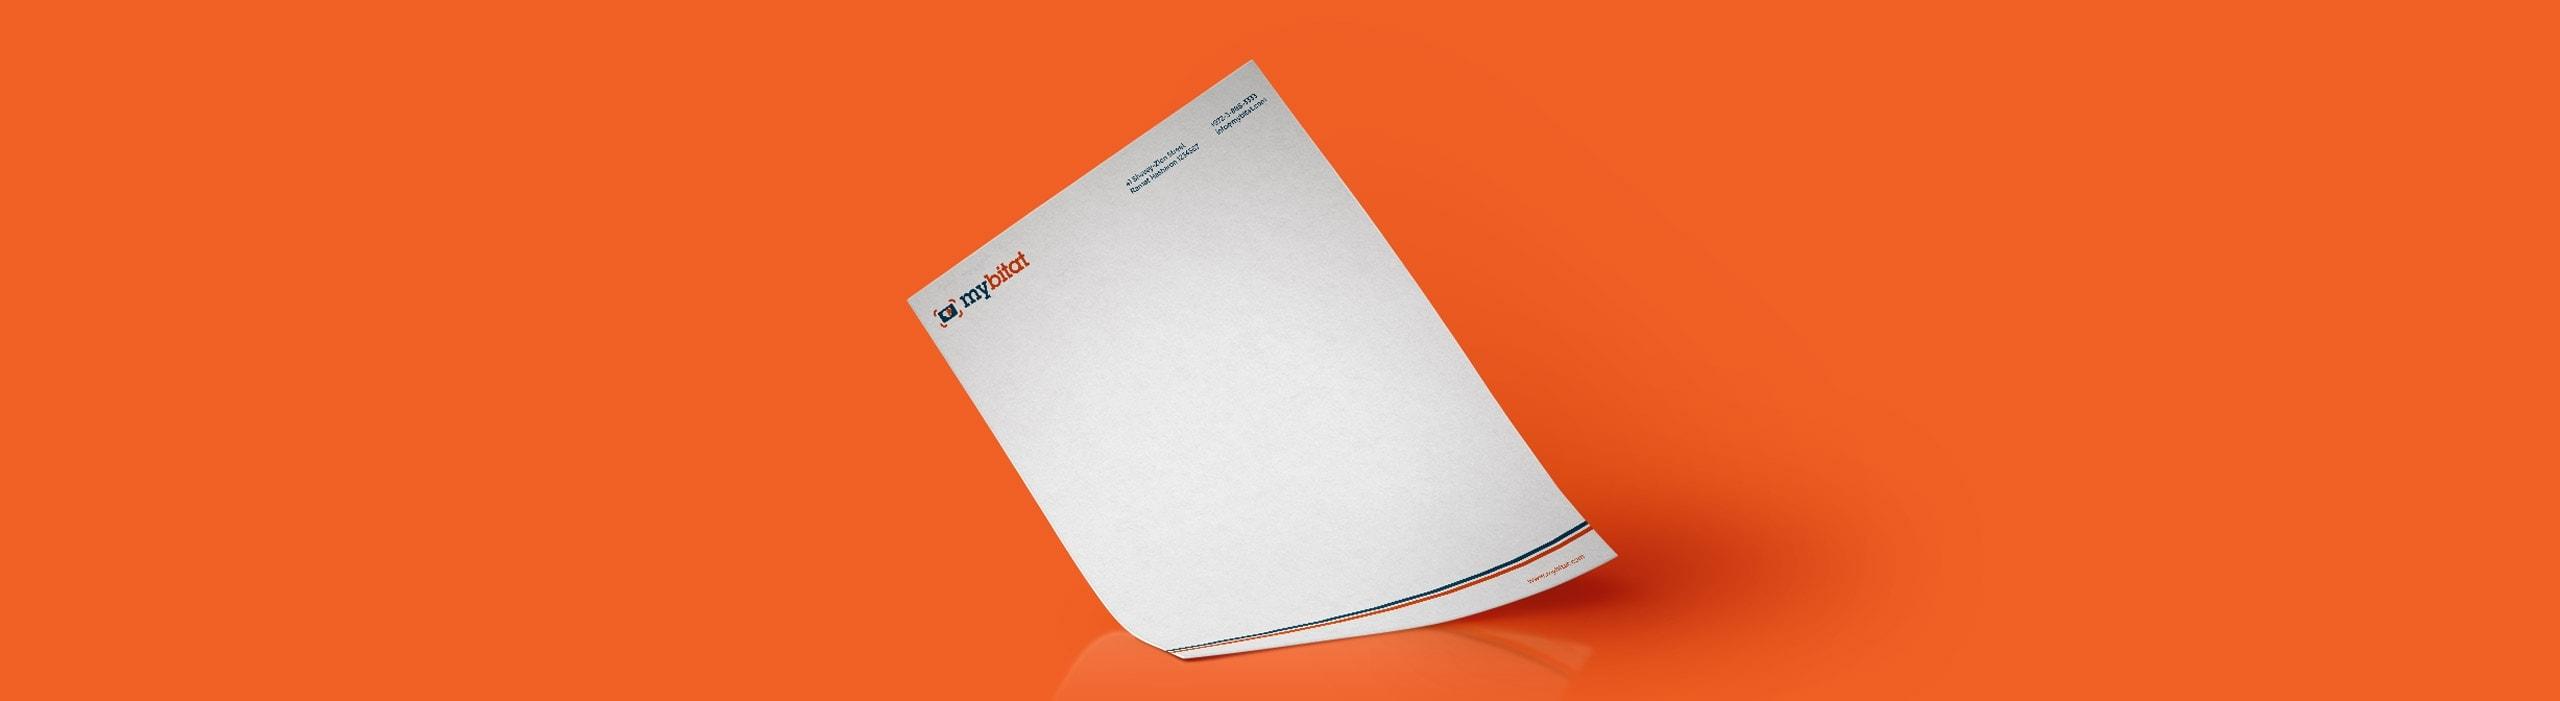 Mybitat - natie-mybitat-letterhead - Natie Branding Agency